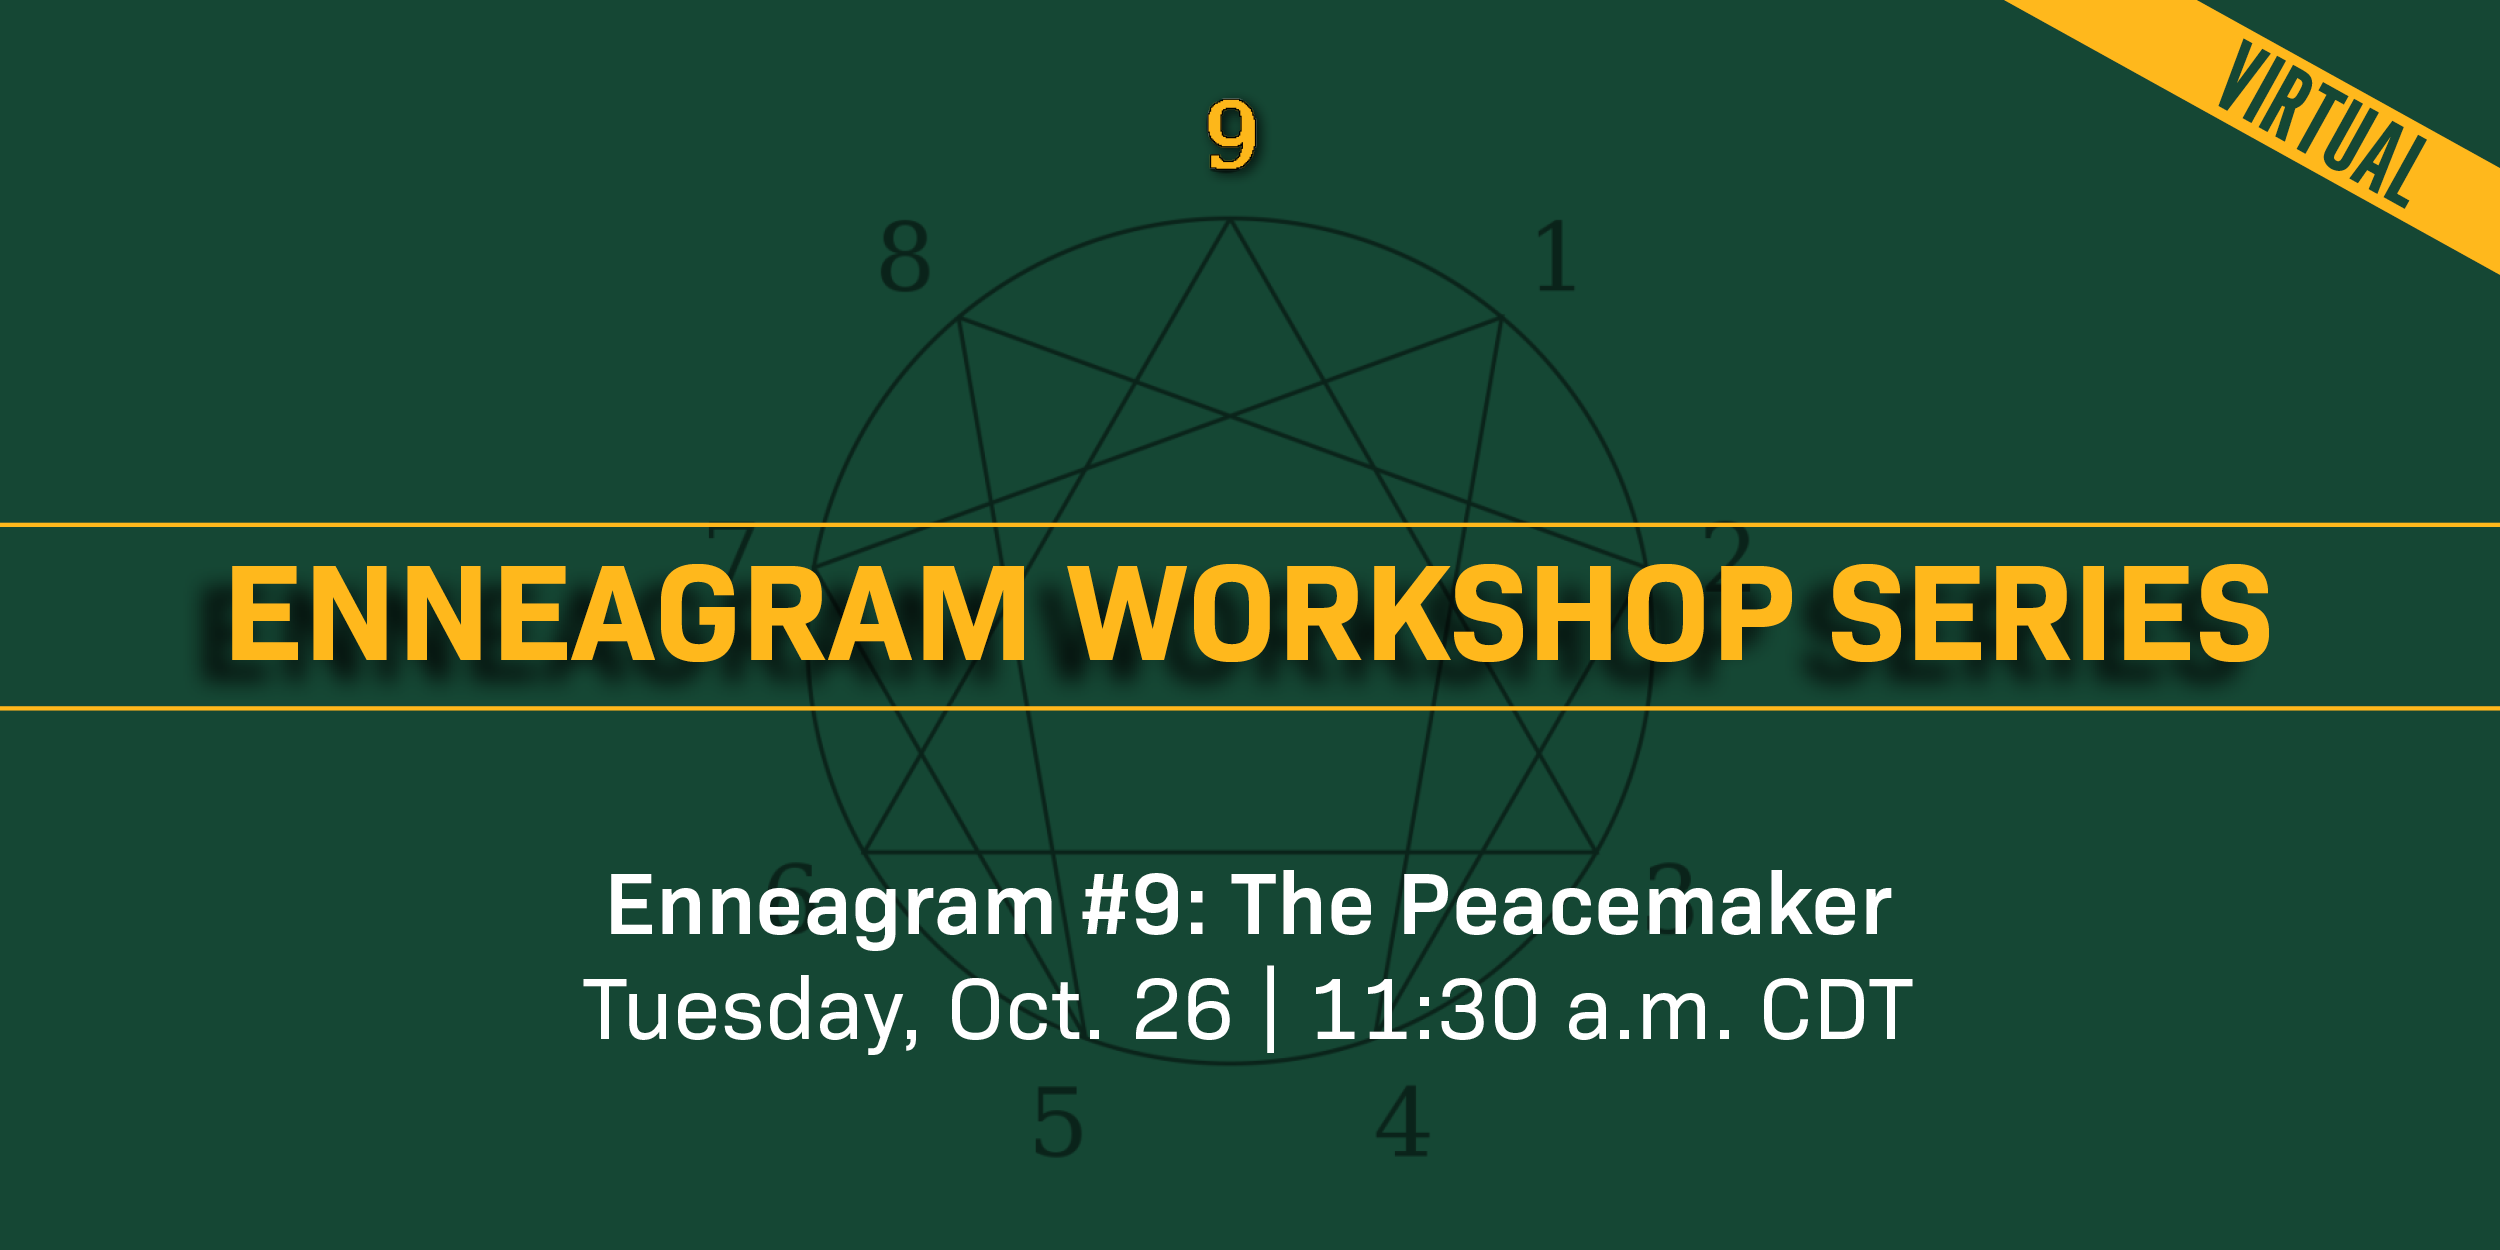 Ennagram Type 9 Banner Announcement